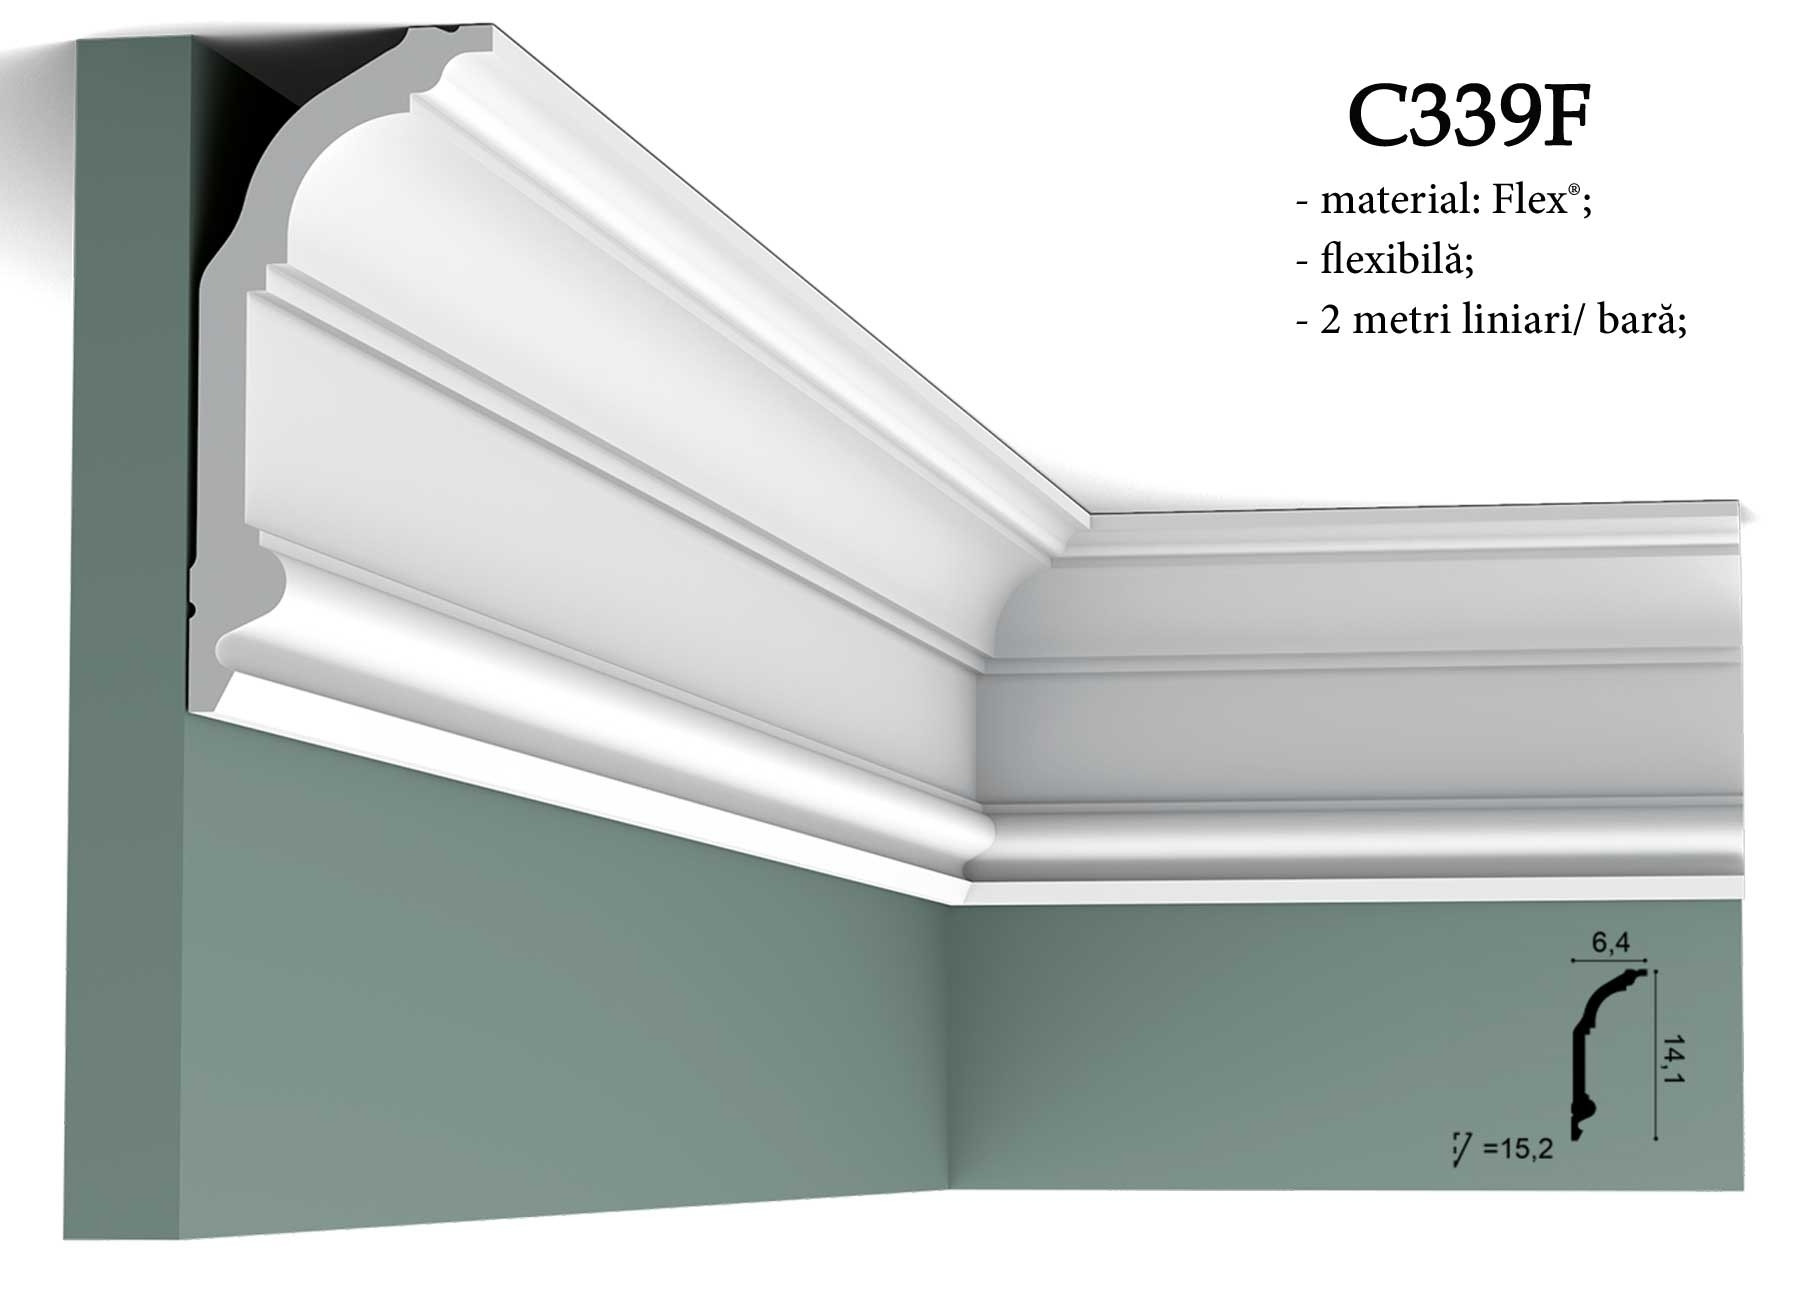 Cornisa flexibila pentru tavan Orac Decor C339F